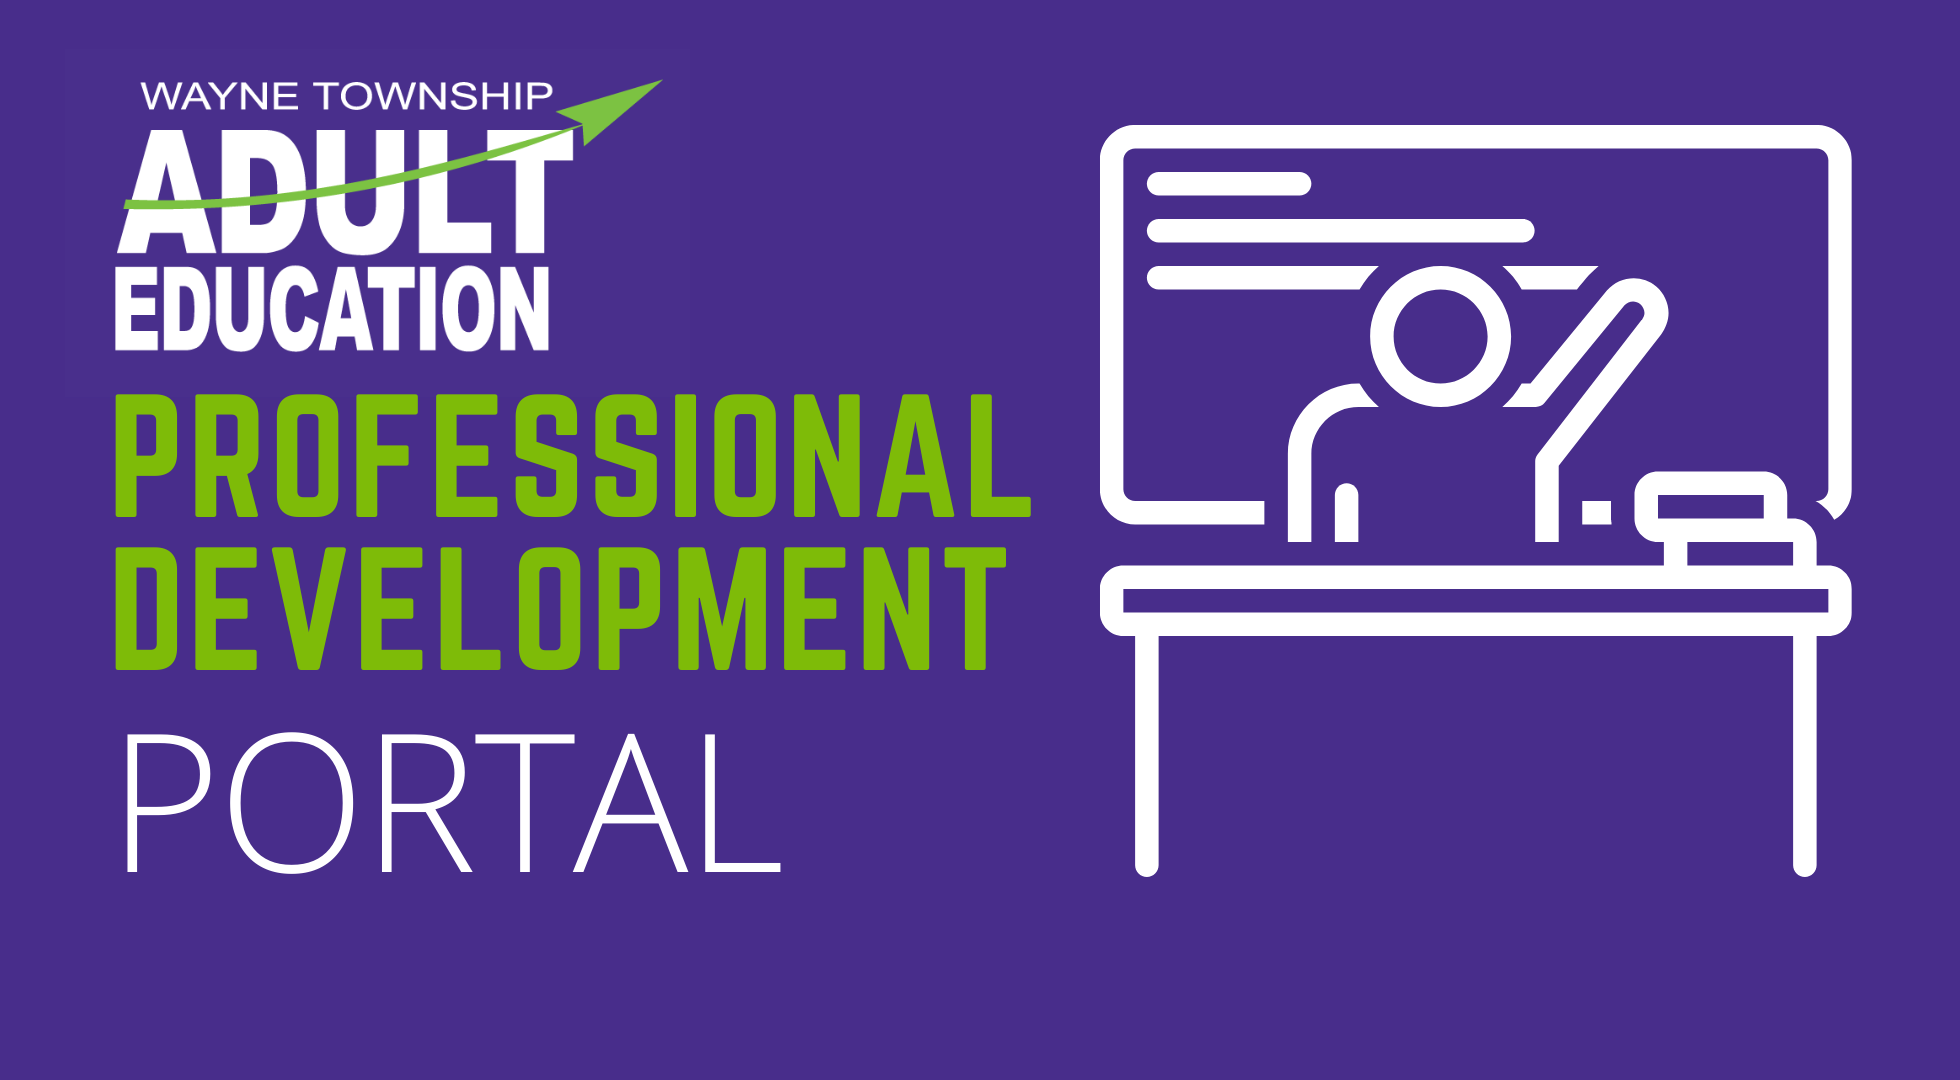 Wayne Township Adult Education Professional Development Portal